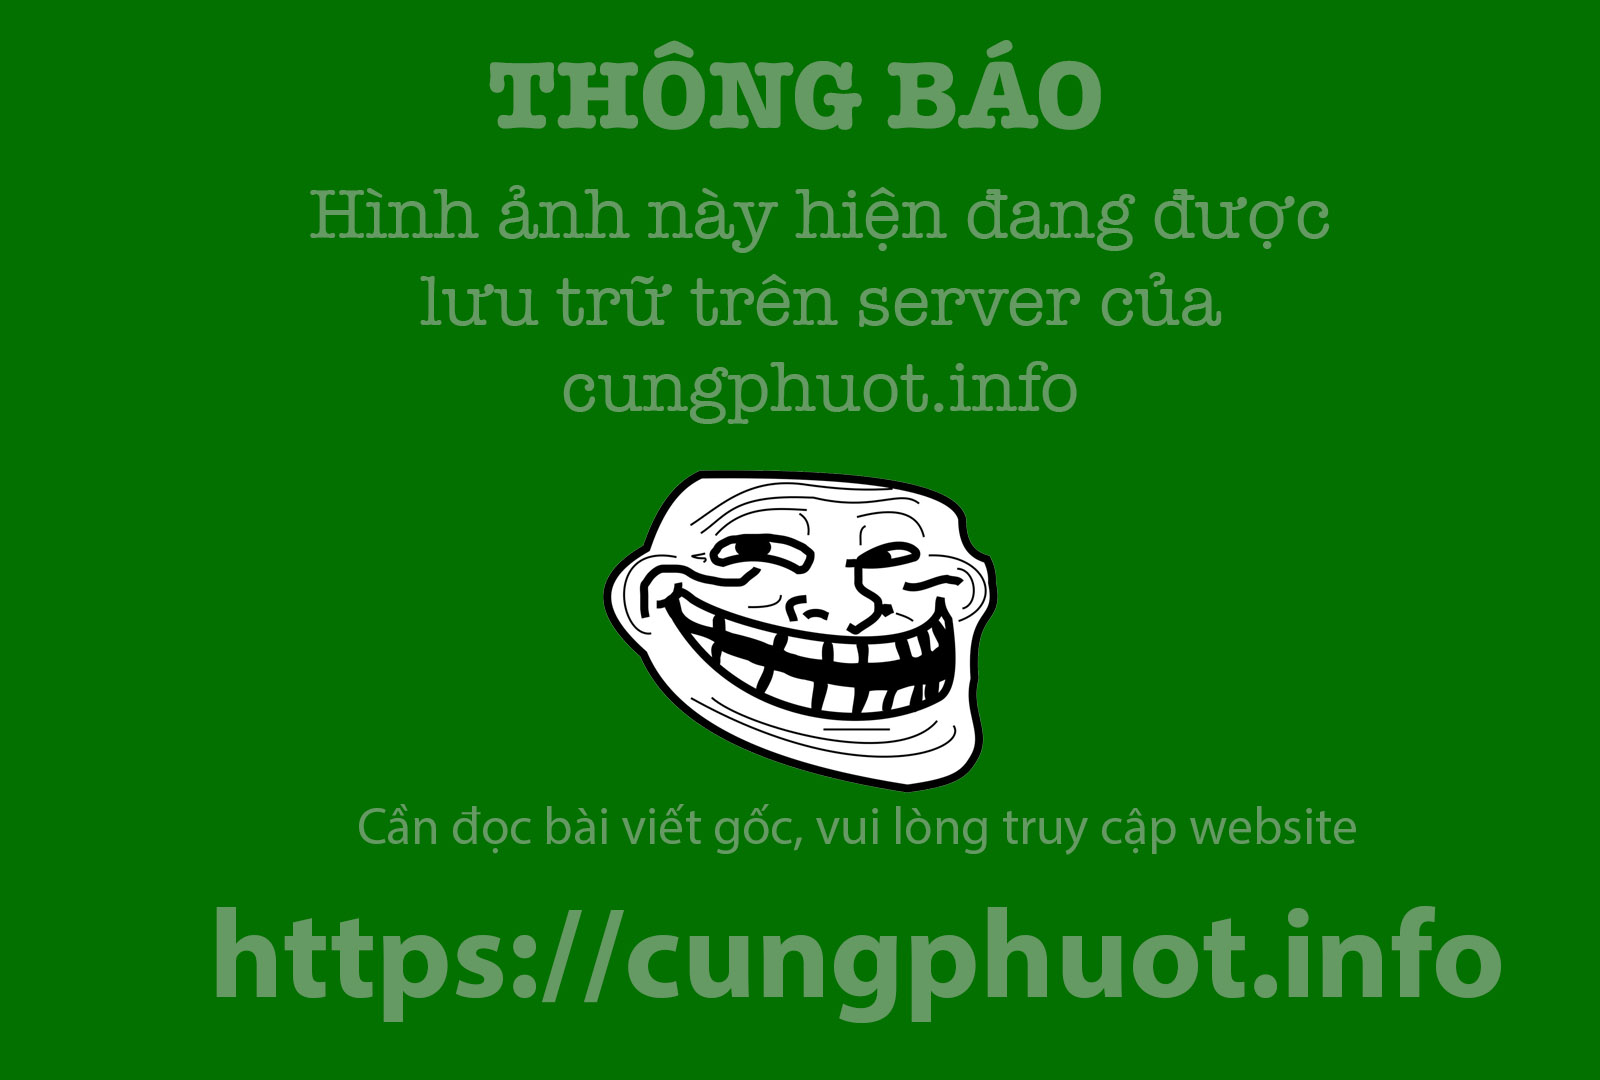 Chon bien cuong 'troi thap, dat cao' o Nam Can hinh anh 5